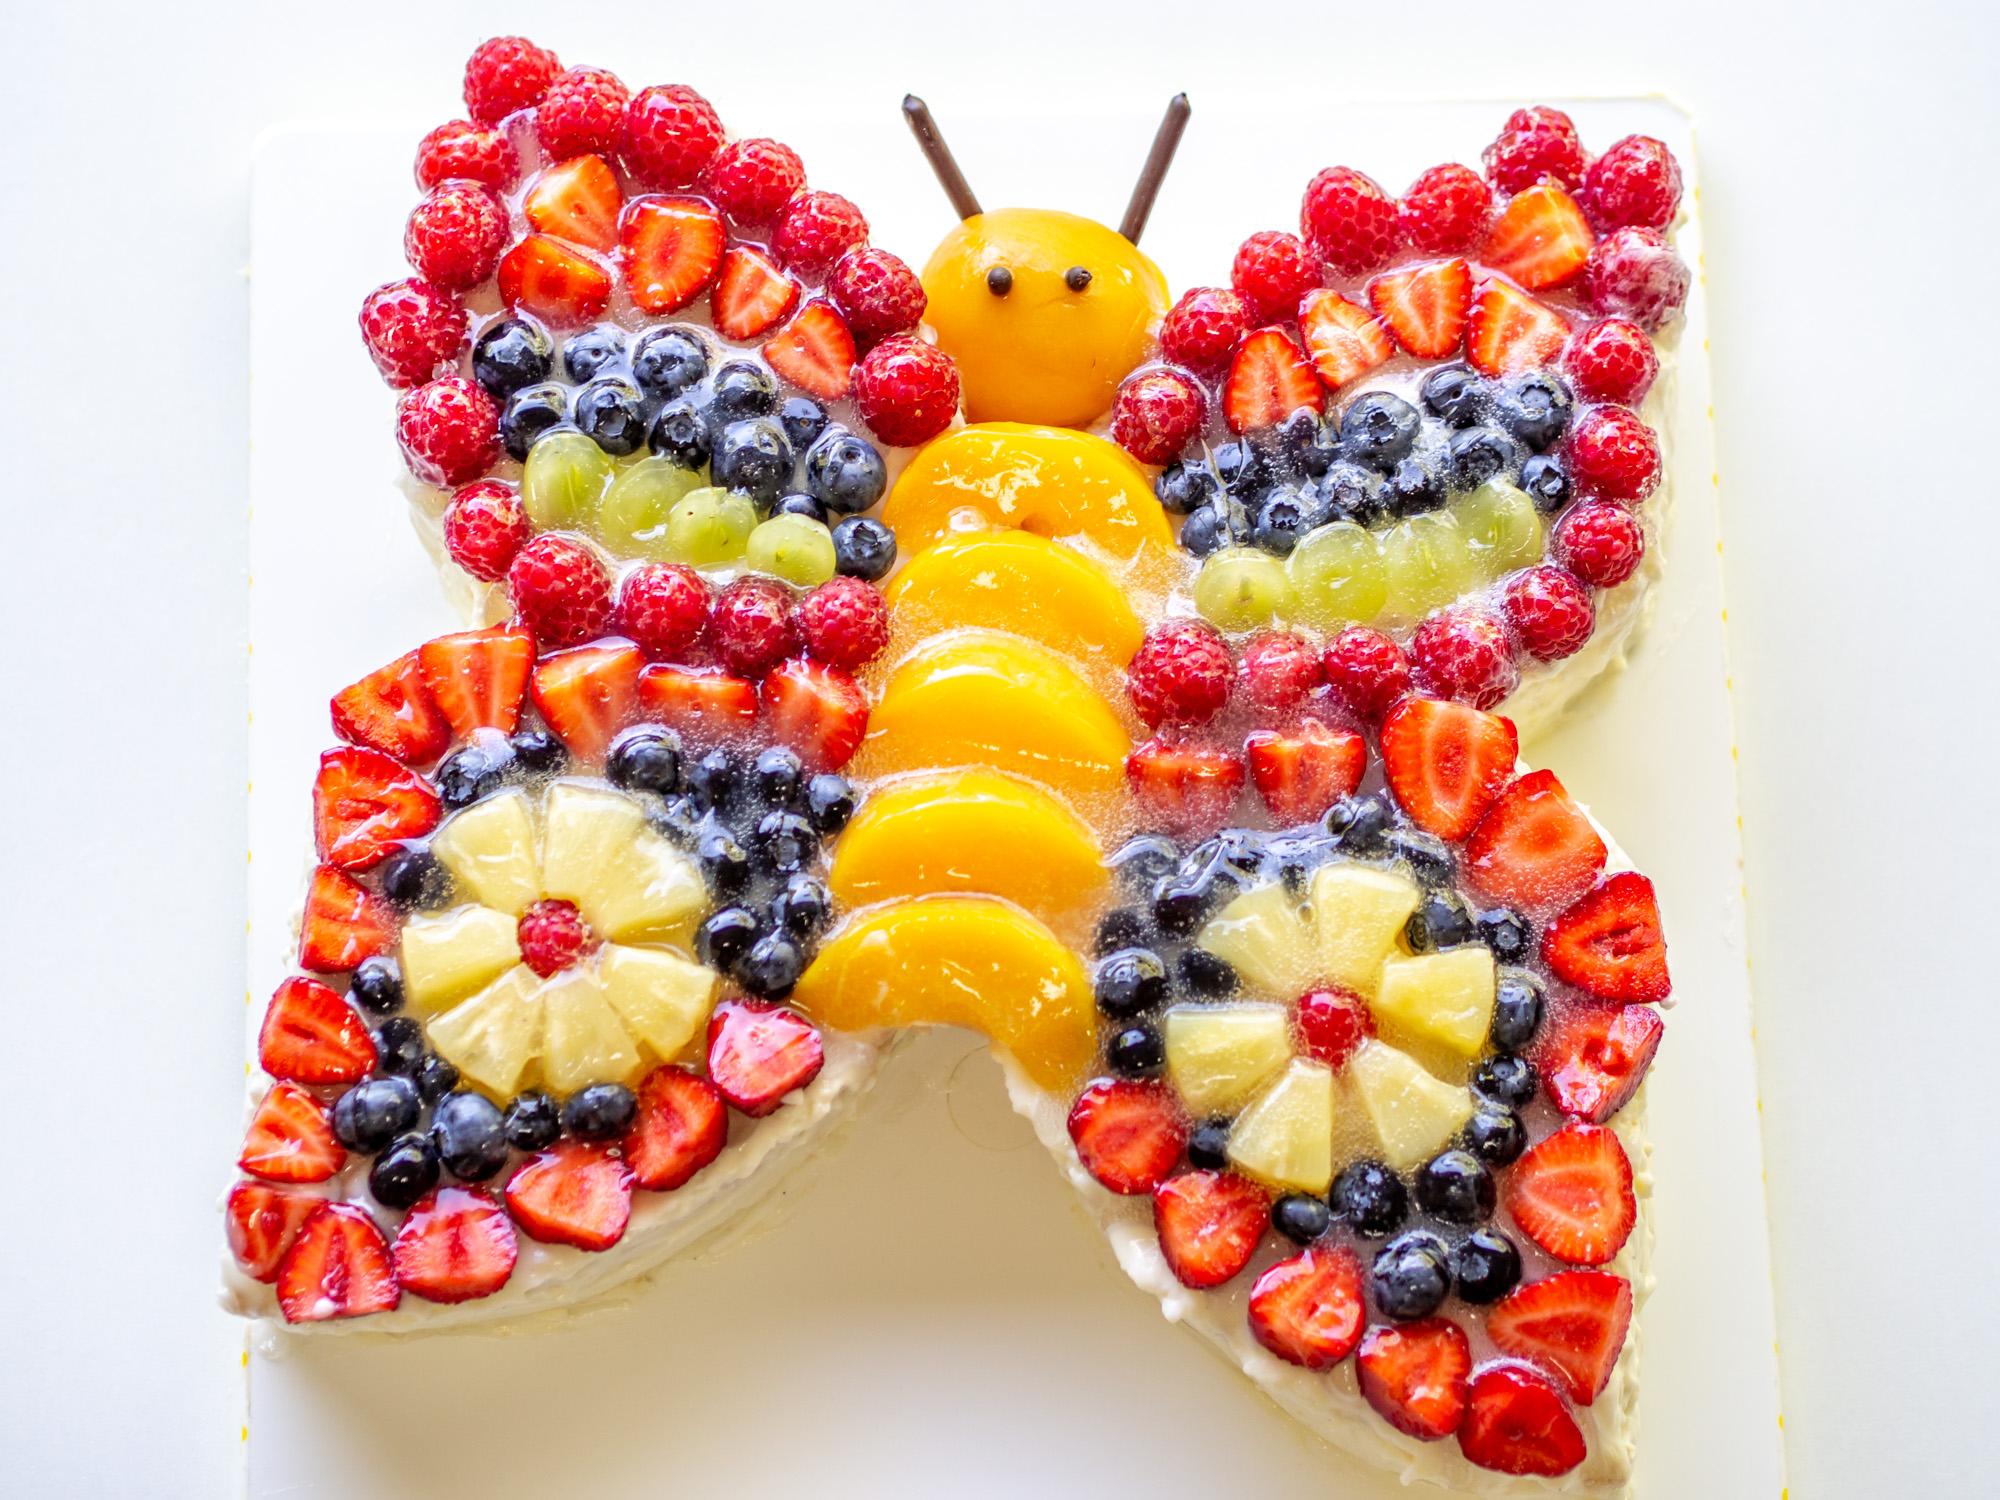 Bunter Schmetterlingstorte Mit Viel Obst Dekoriert Perfekt Fur Kinder